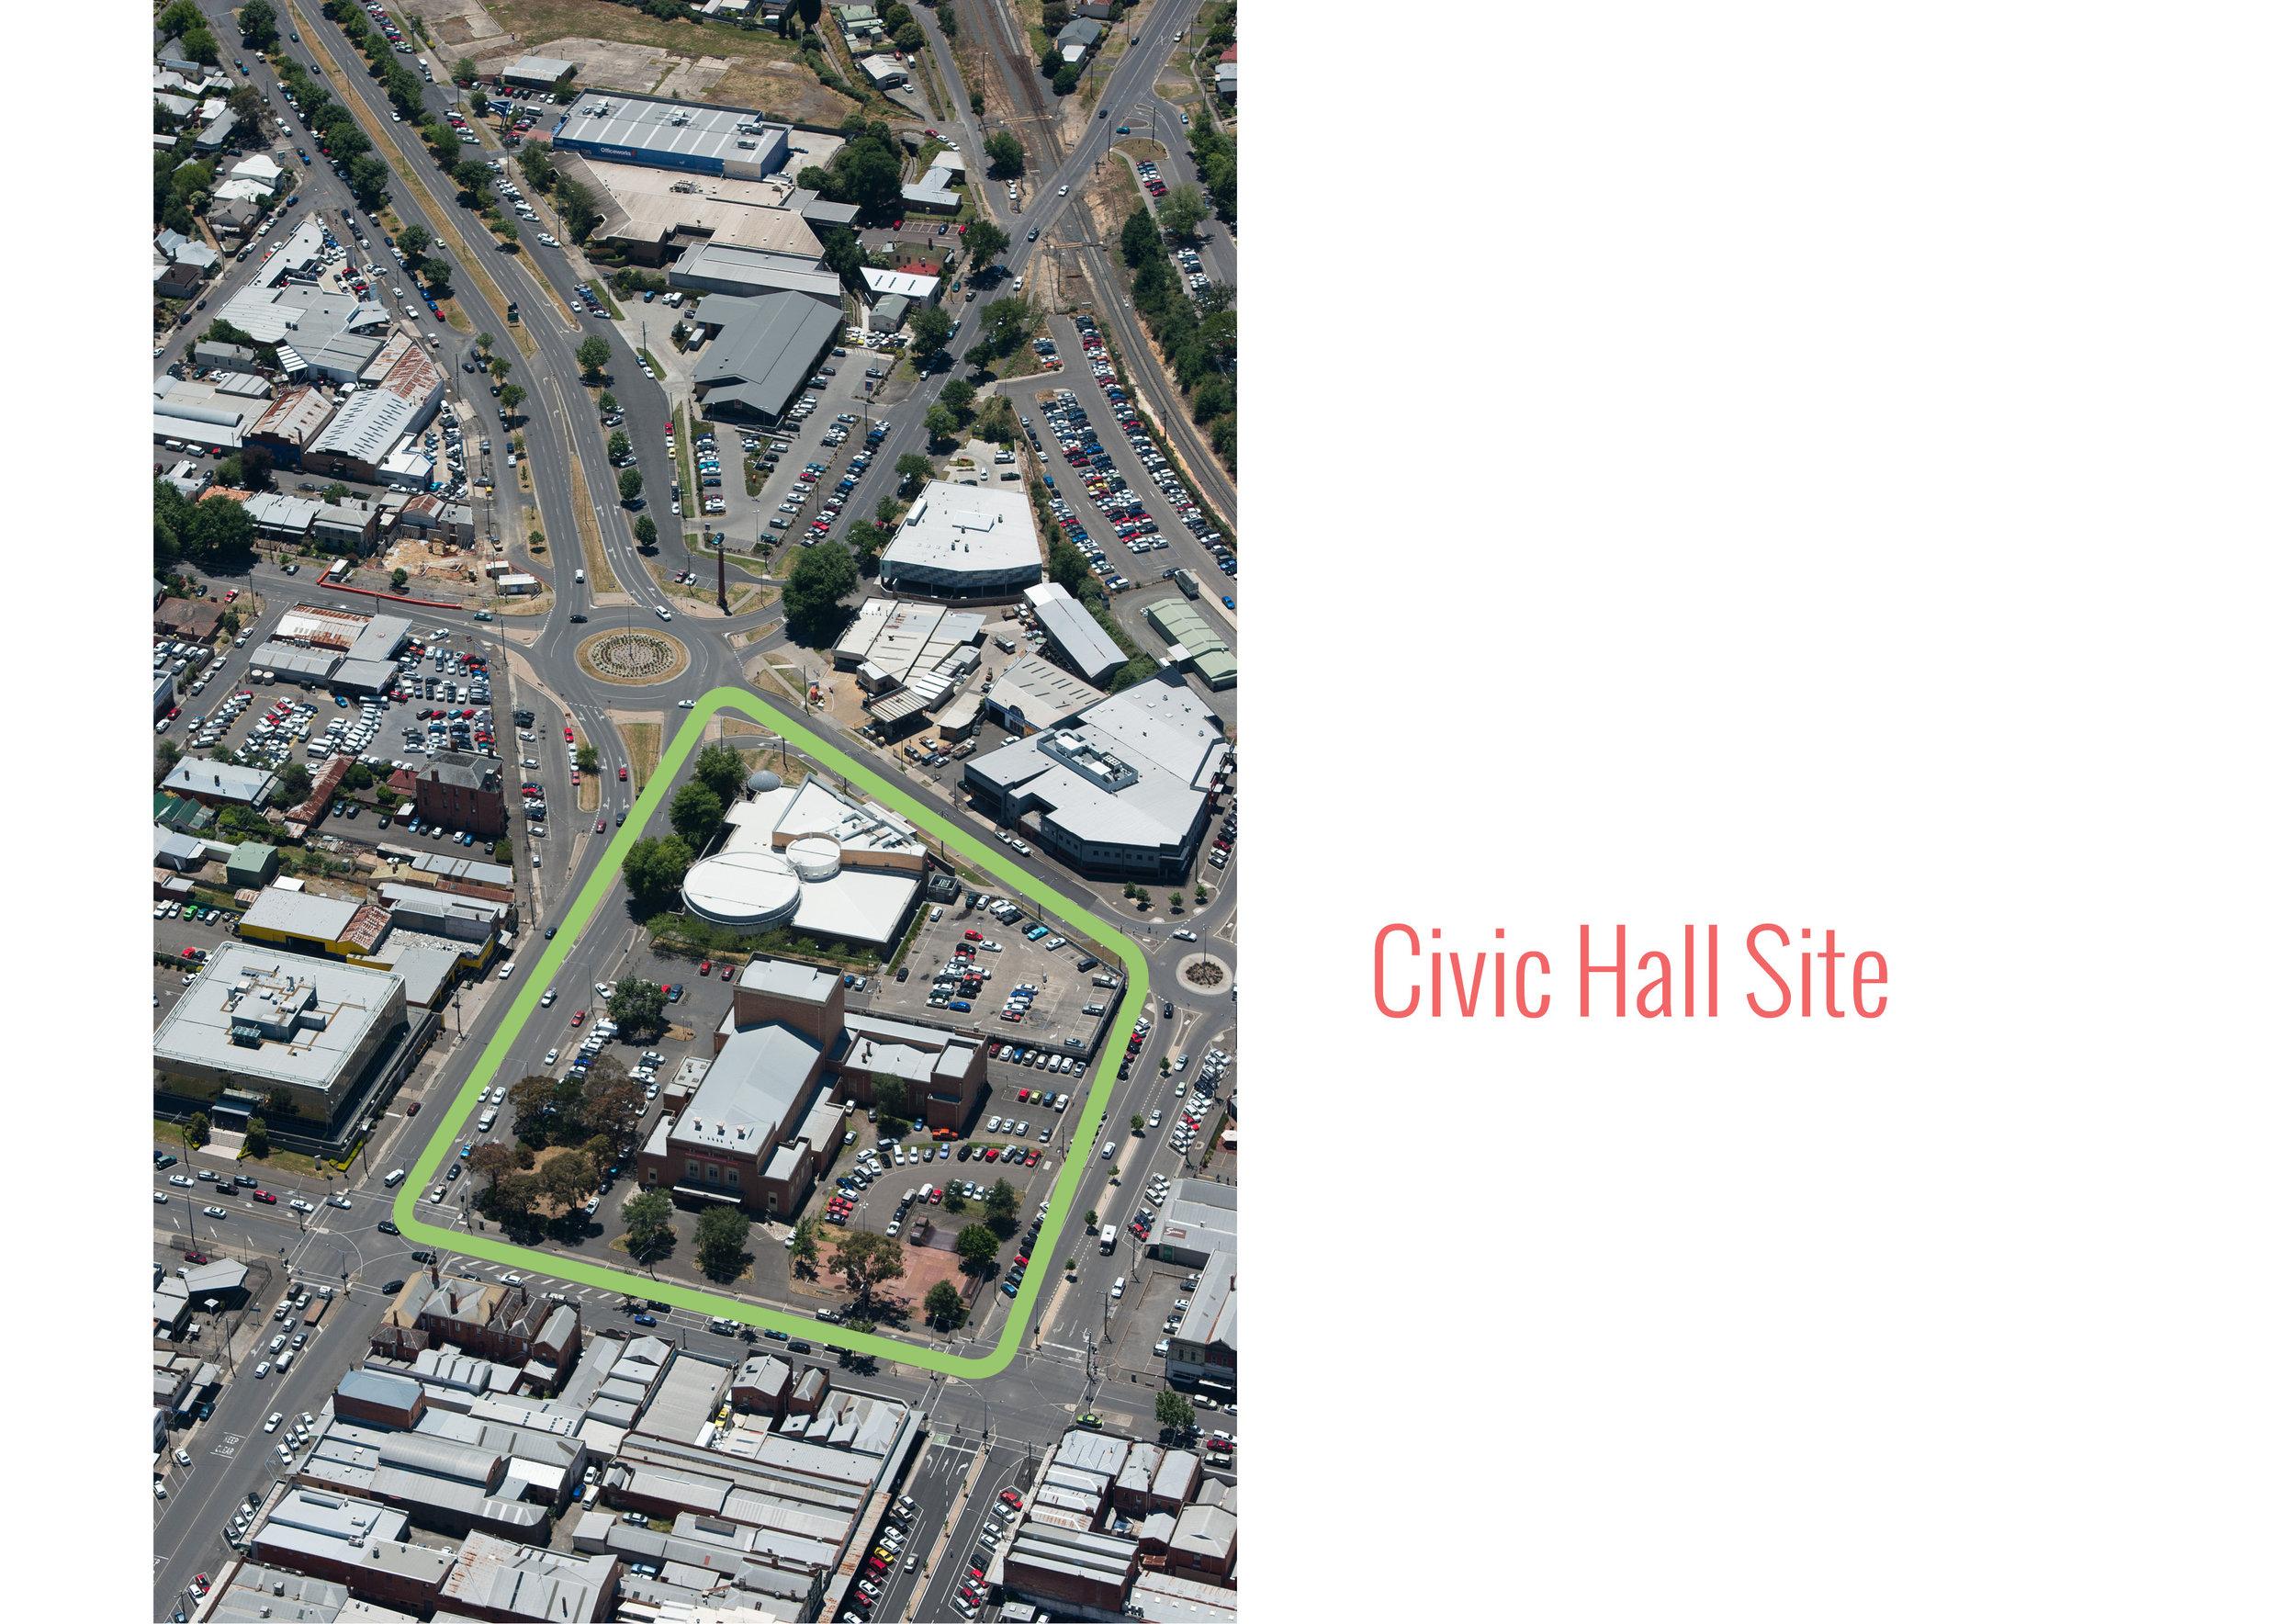 032_CivicHallSite_graphic.jpg